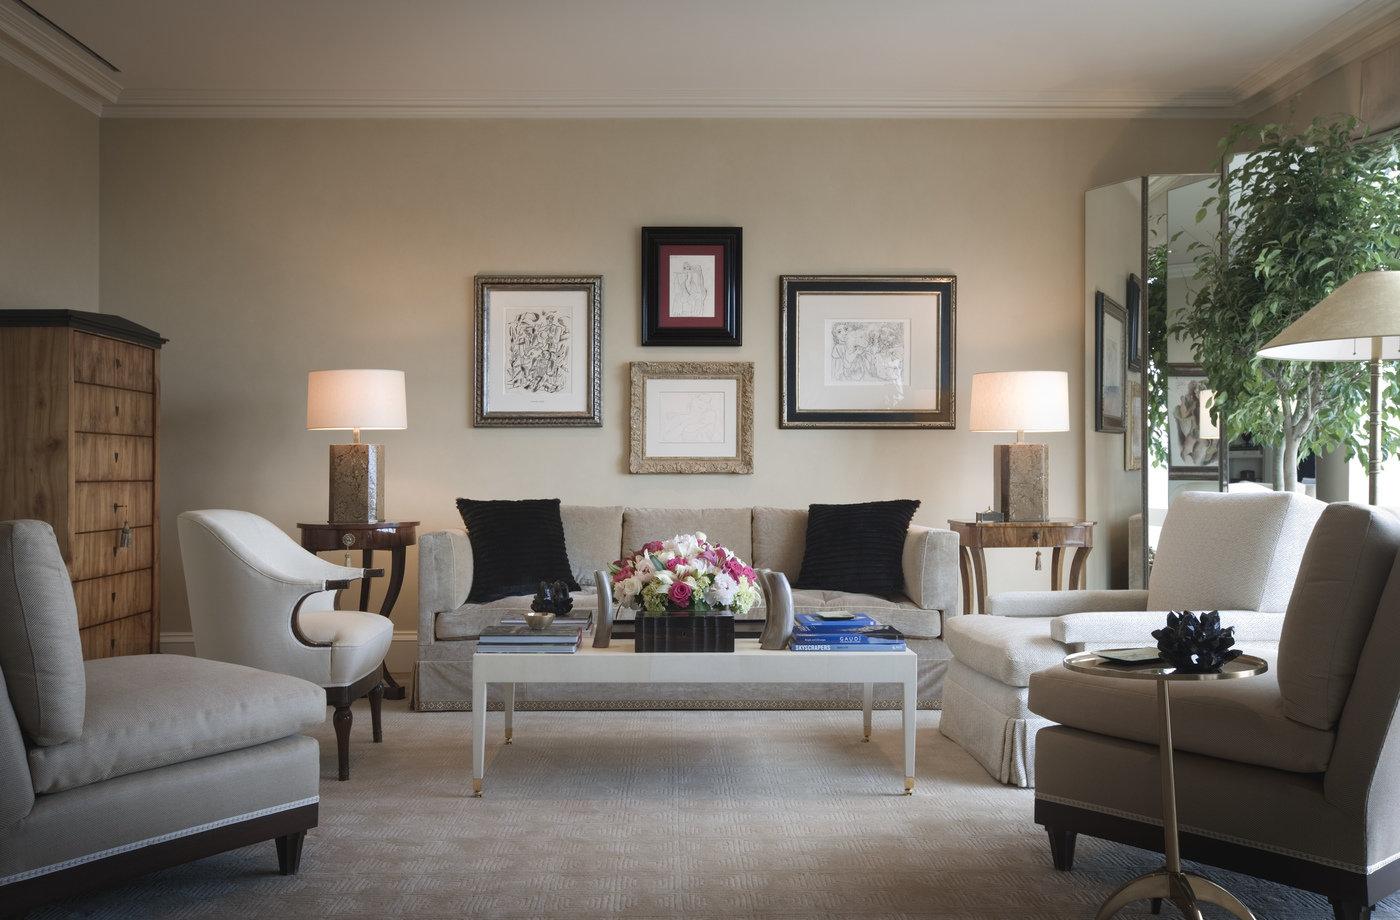 Alexa hampton west side apartment a 1400 32x 147x3567x2492 q85